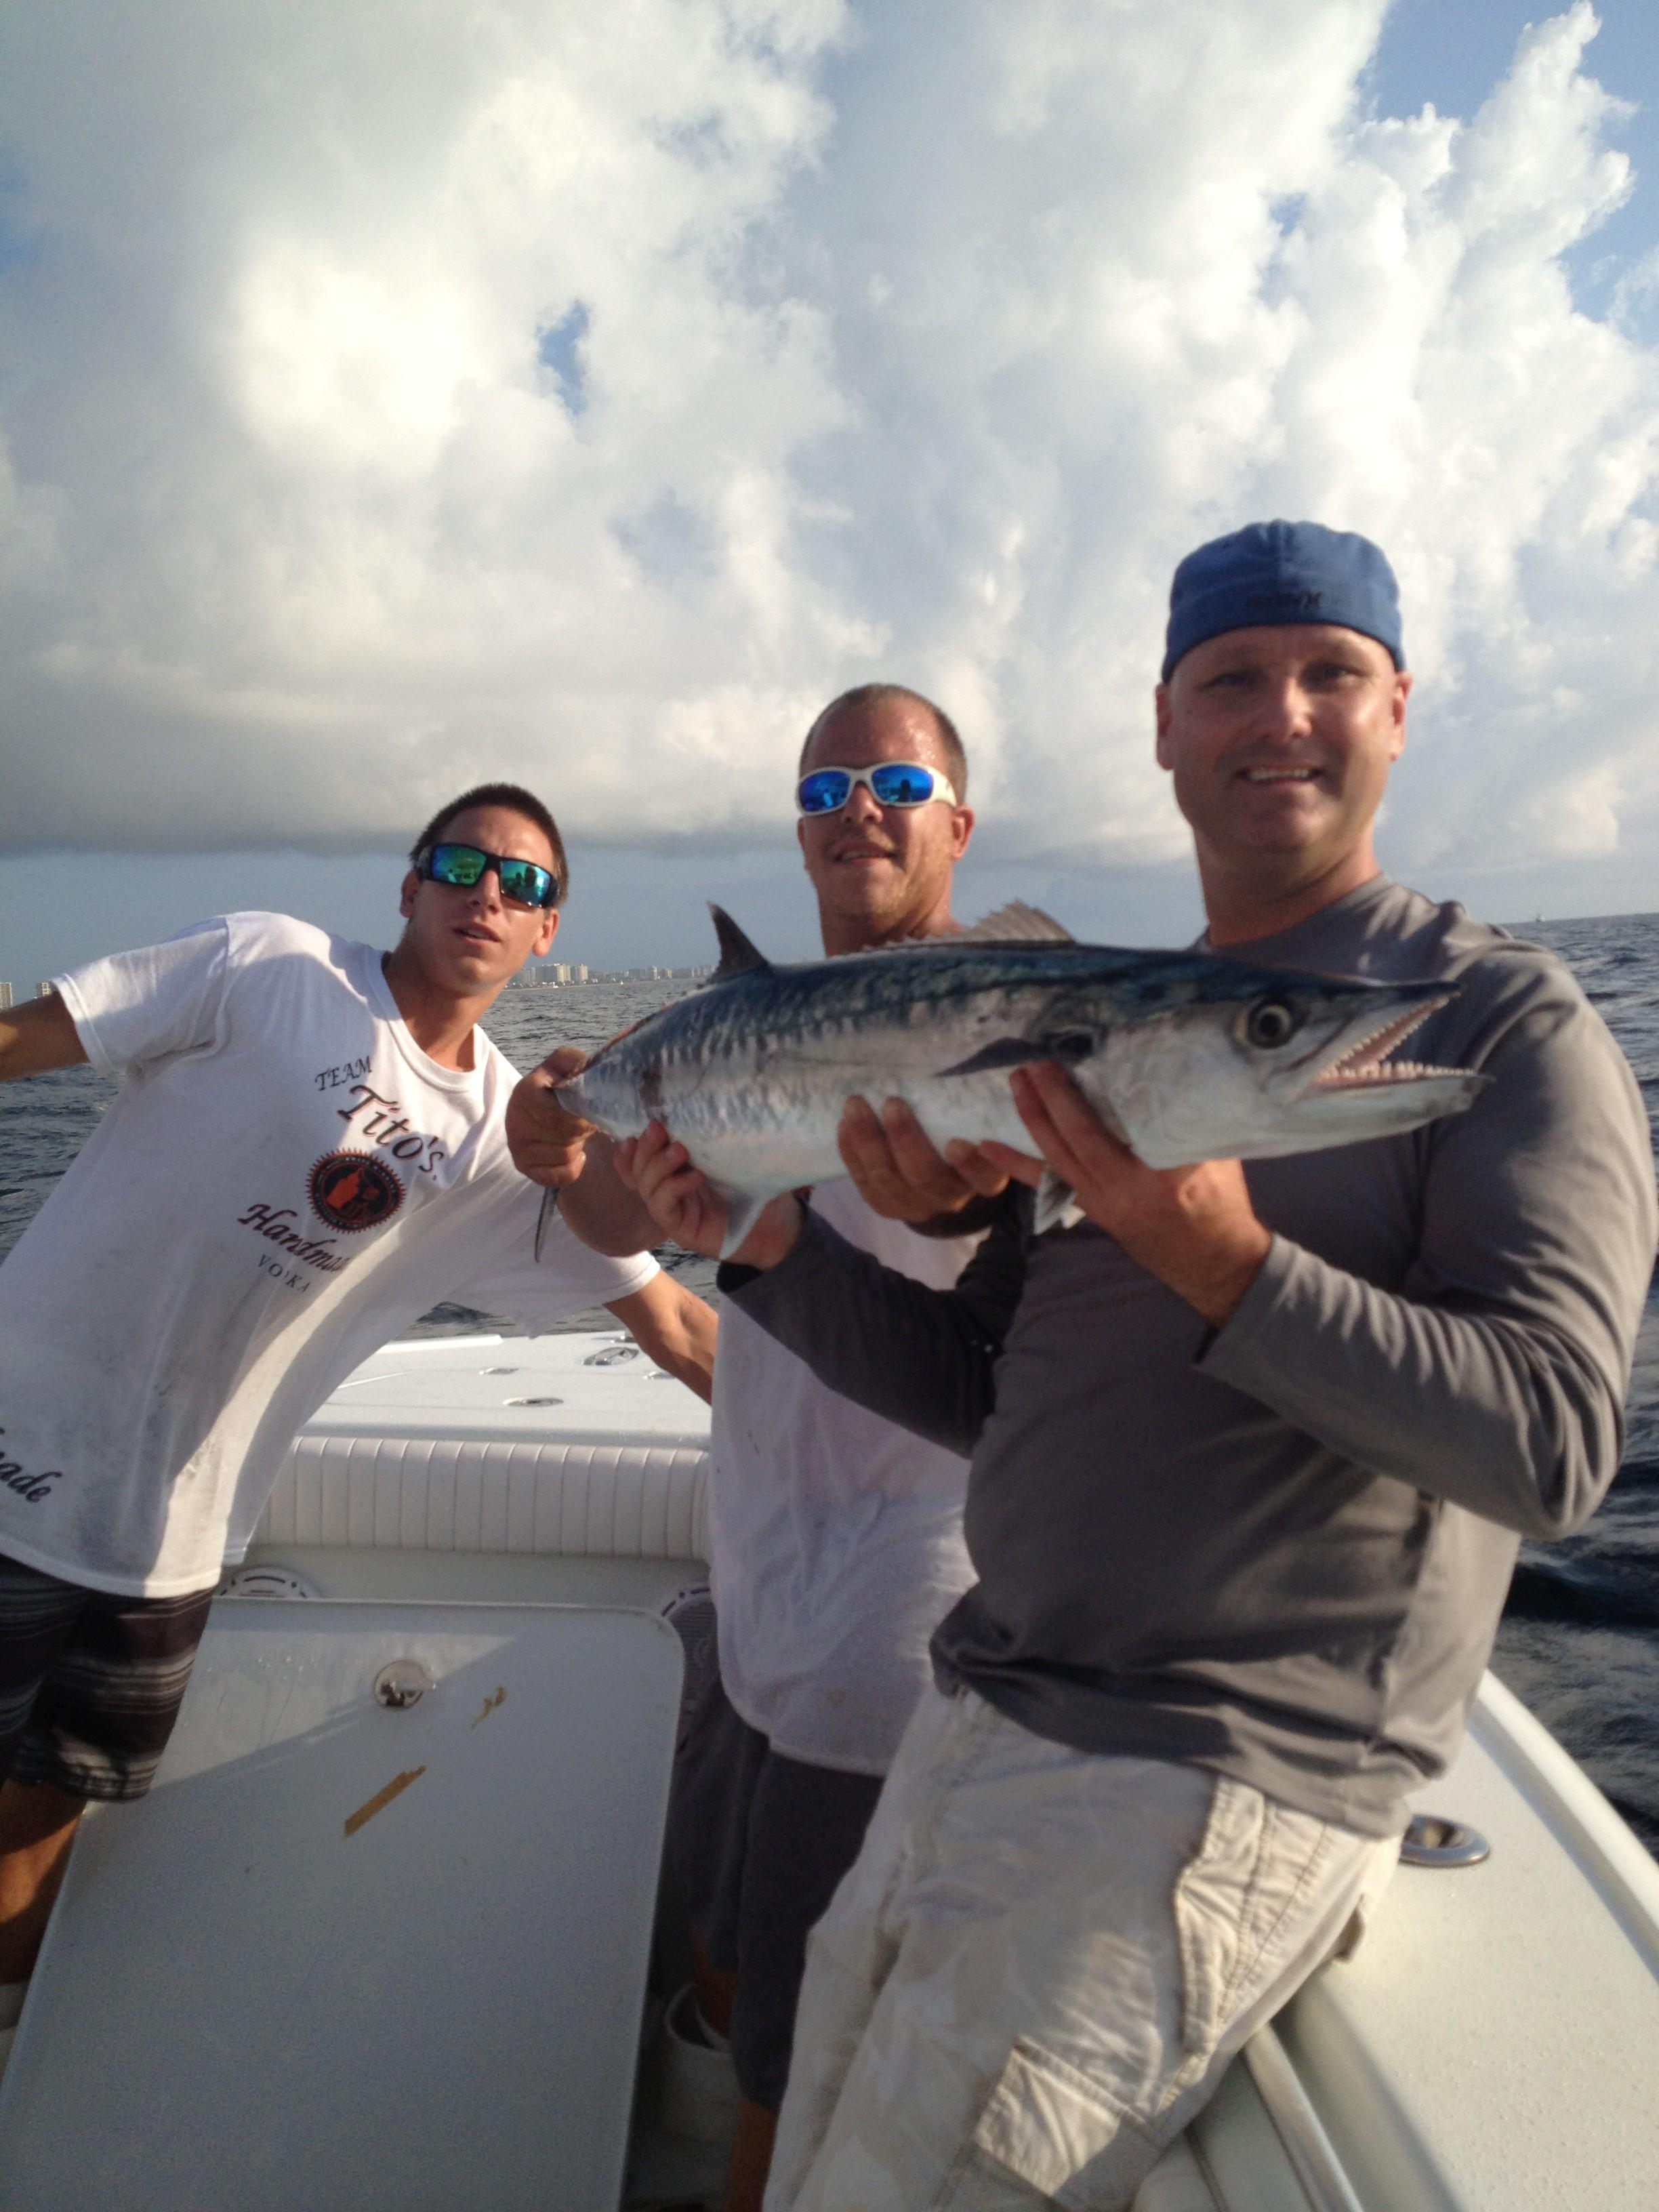 Scott, Joe, and Jamie with a kingfish